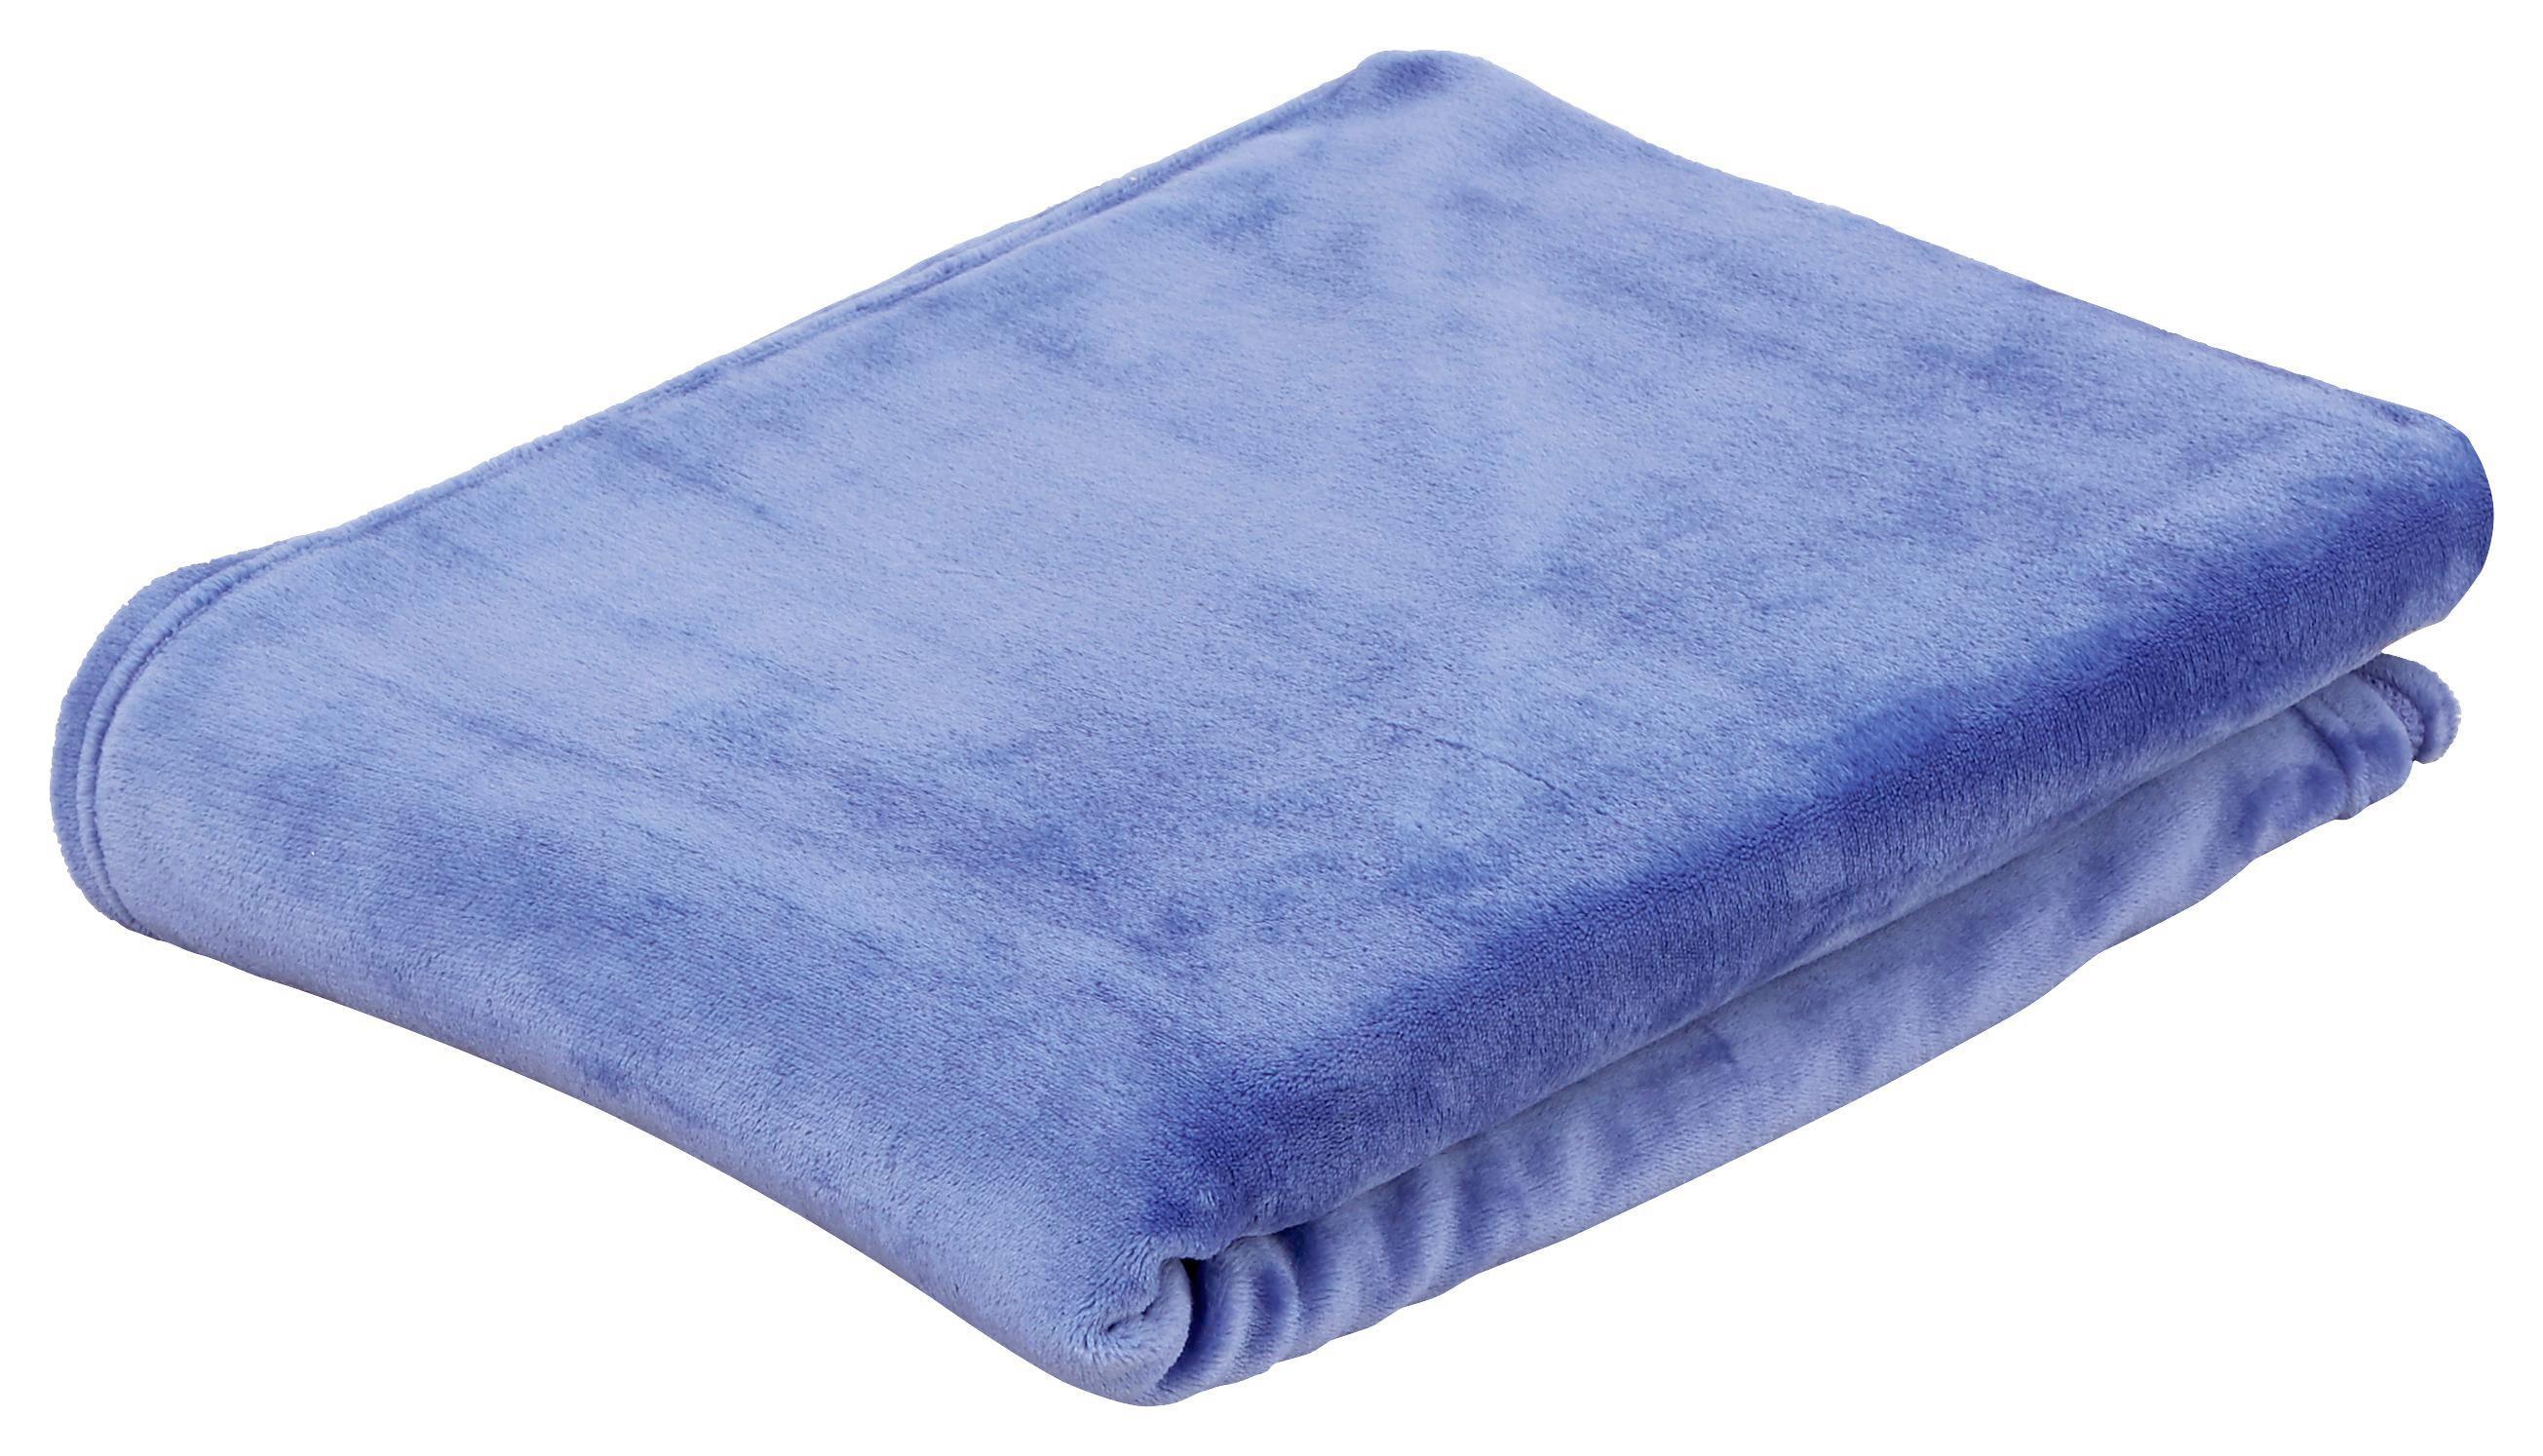 Puha Takaró Marlies - kék, konvencionális, textil (150/200cm) - LUCA BESSONI